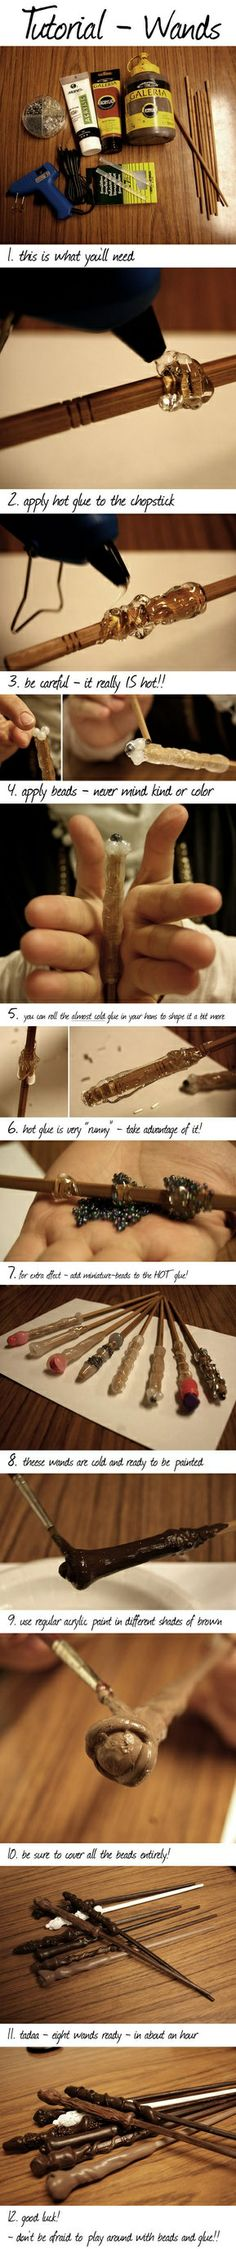 Harry Potter wands DIY